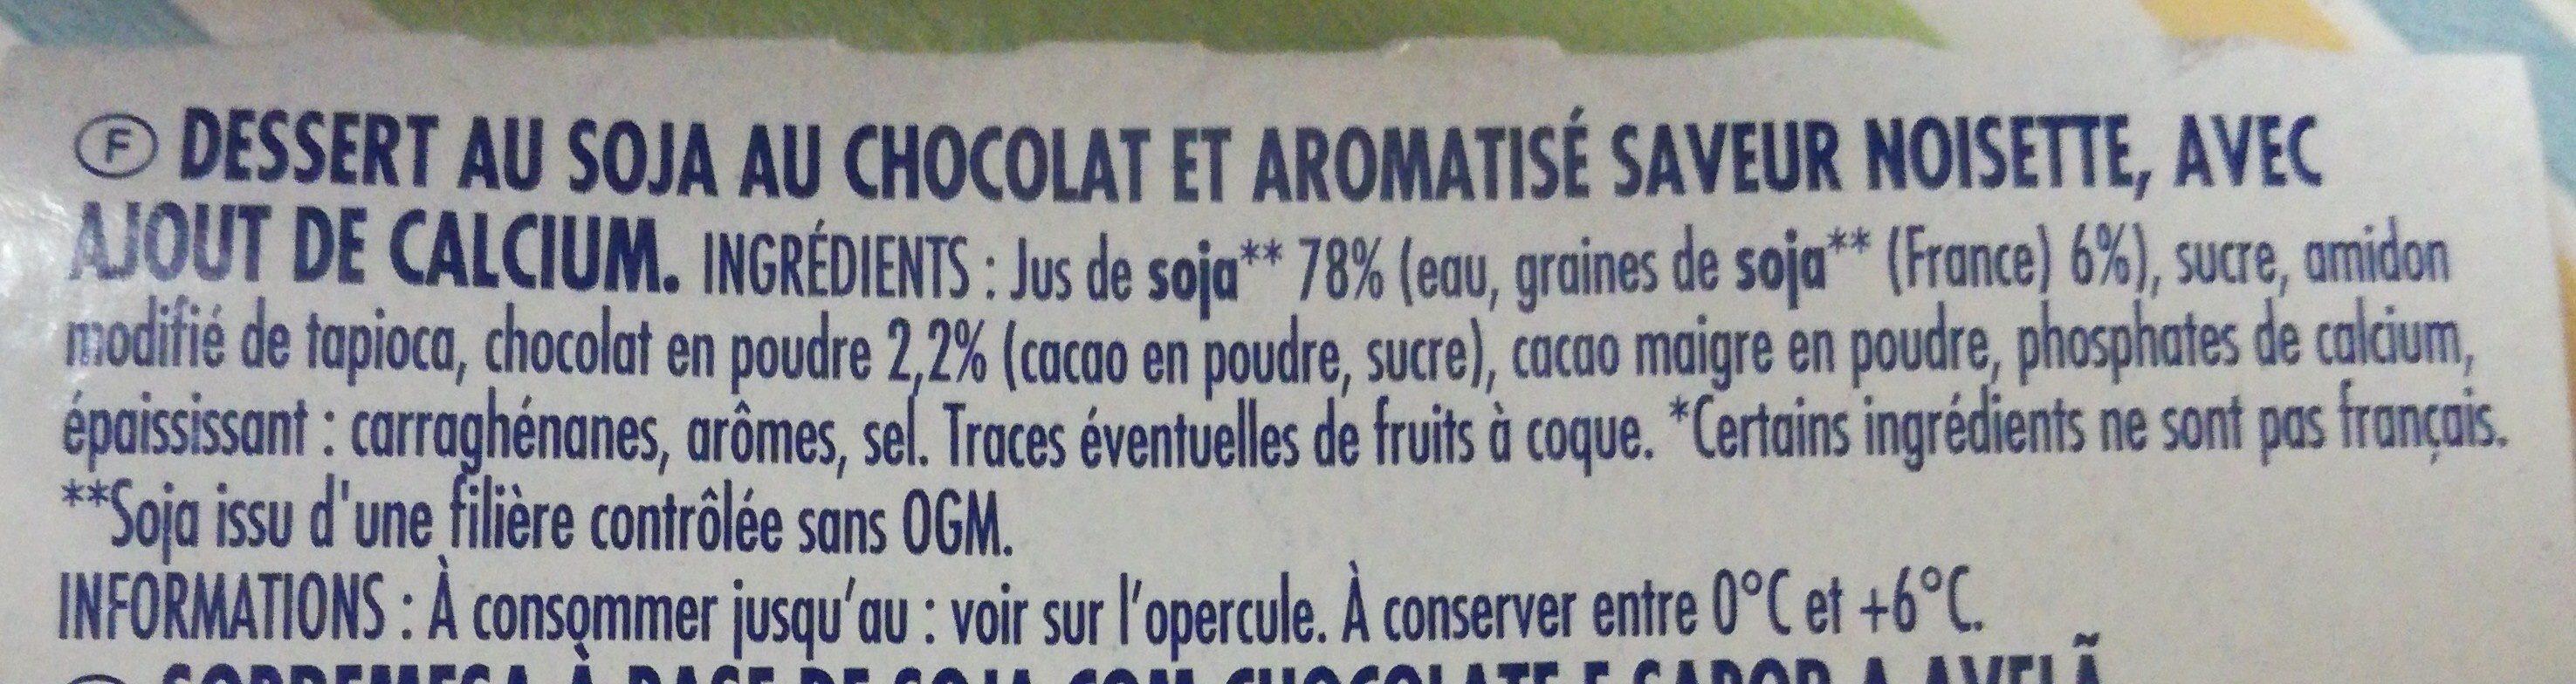 Soja Chocolat saveur noisette - Ingrédients - fr